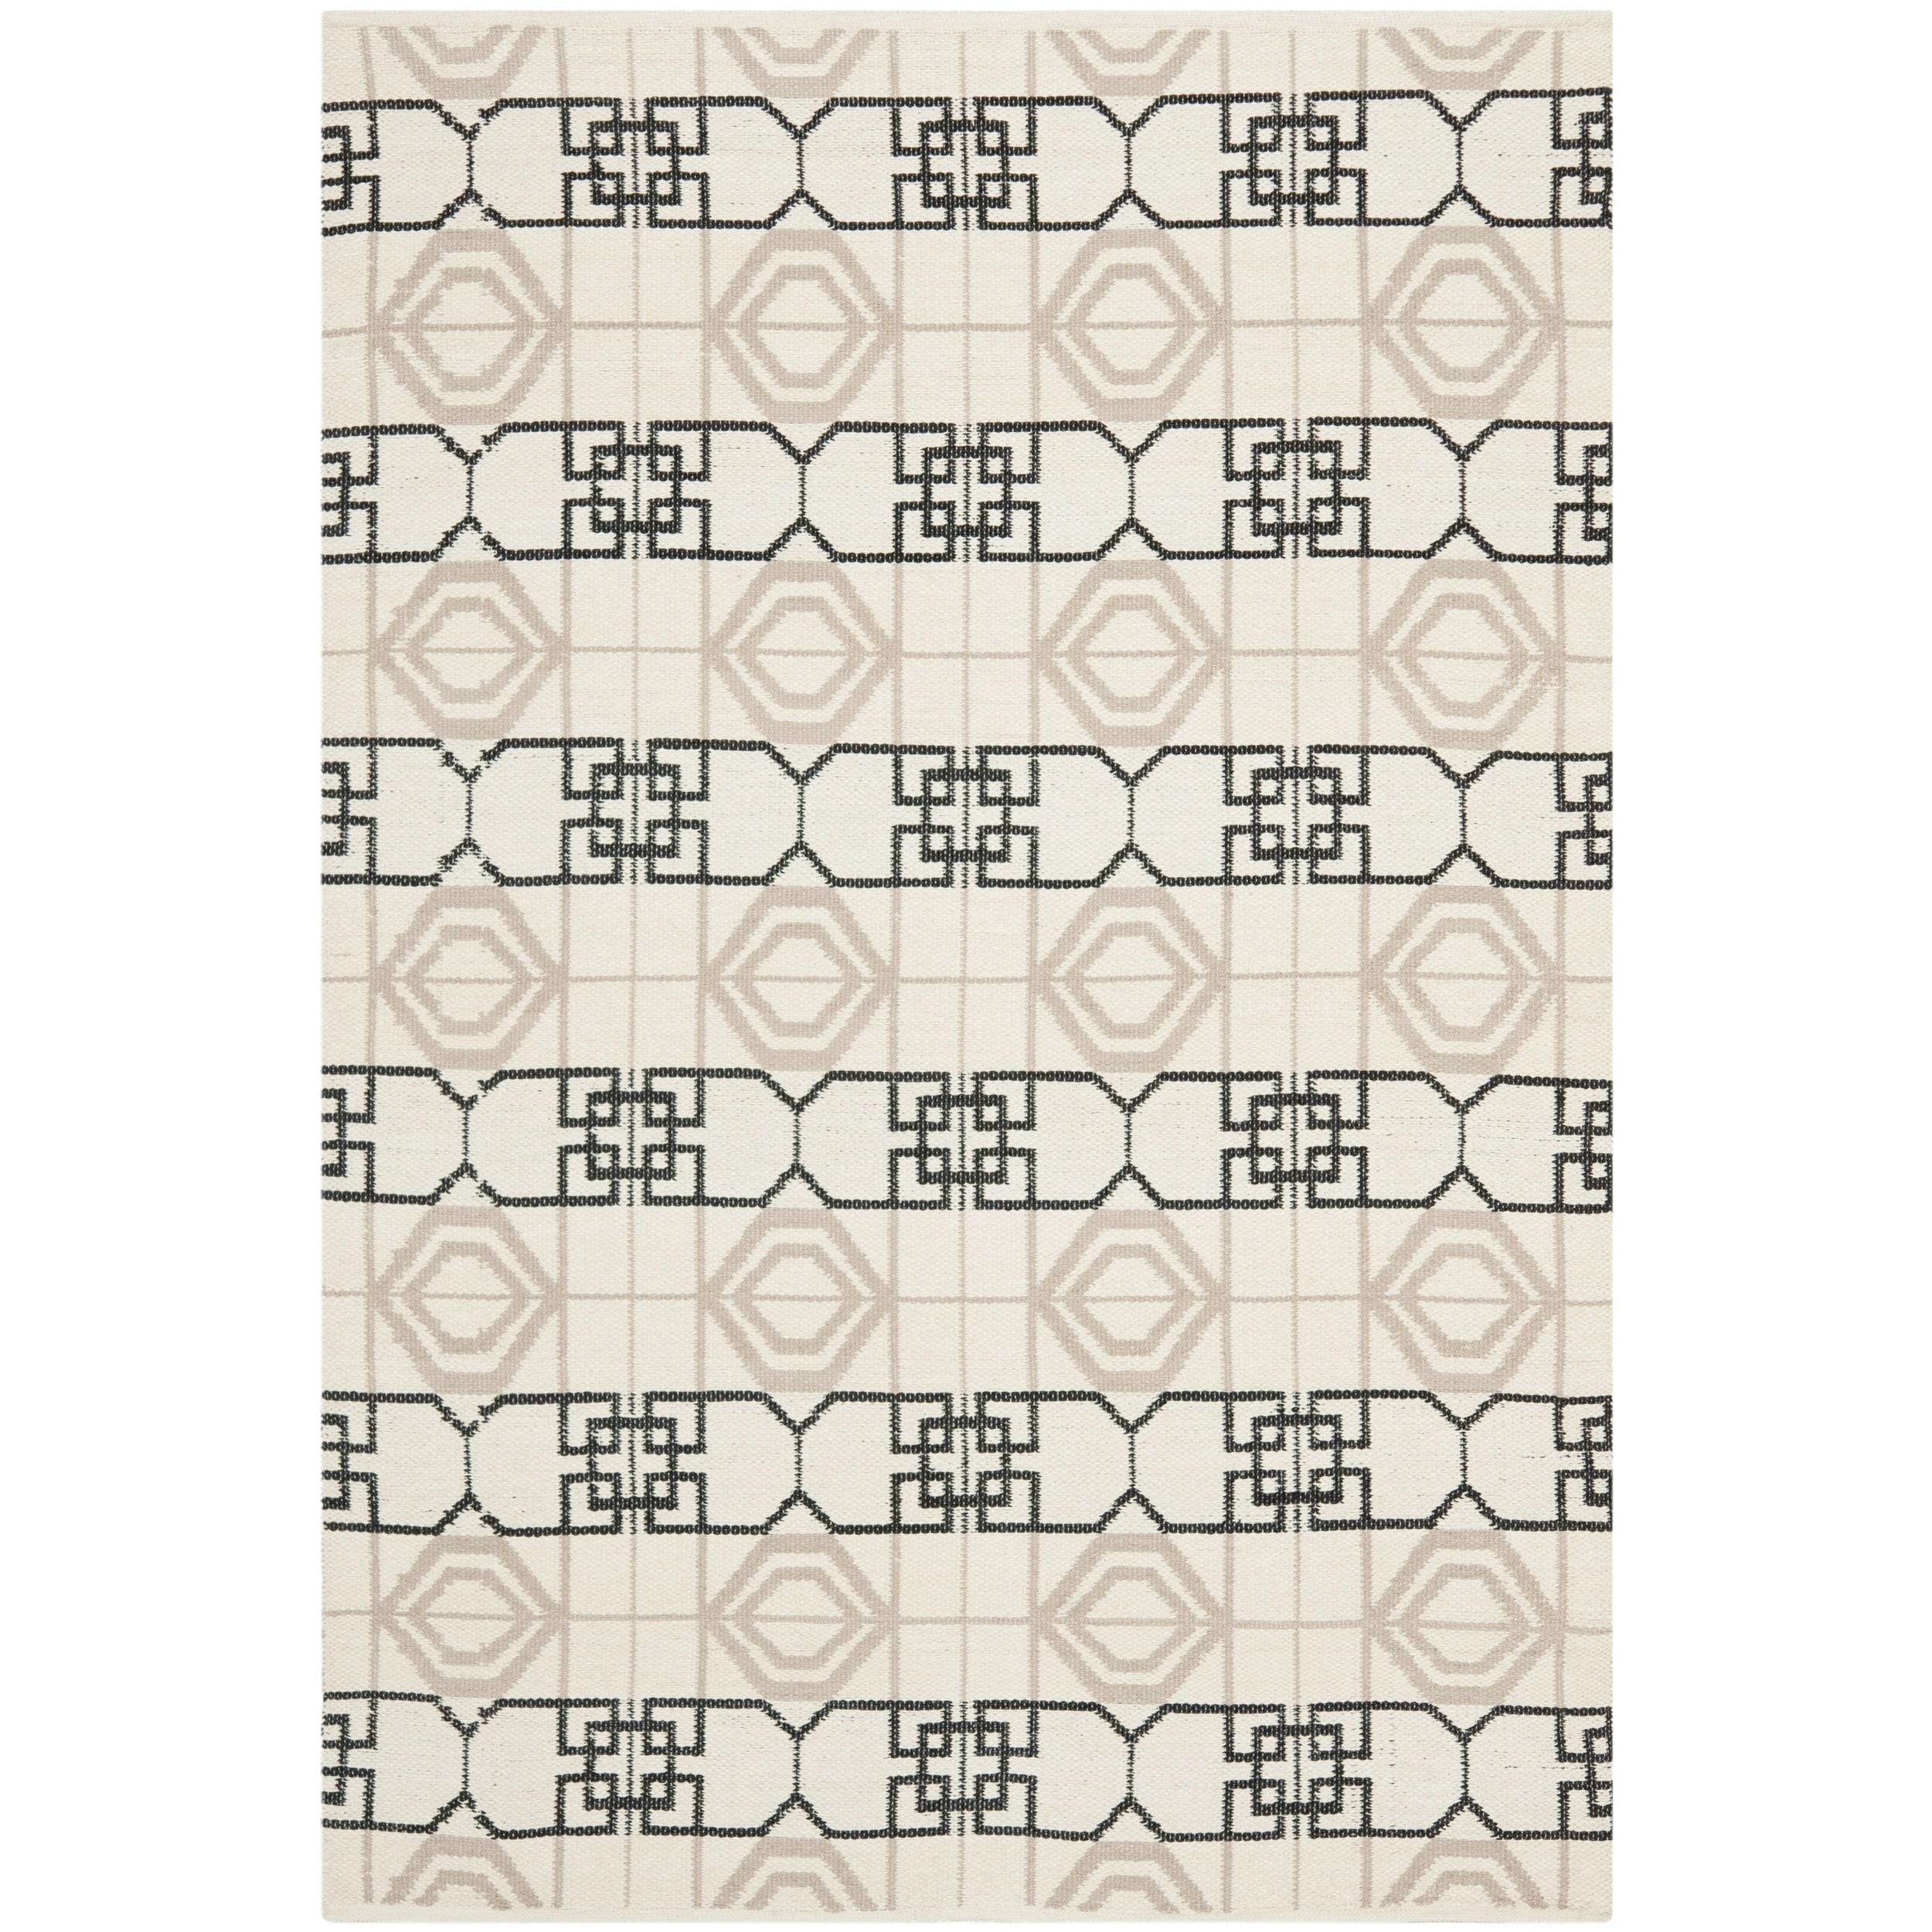 Safavieh Thom Filicia Hand-woven Indoor/ Outdoor Black/ Beige Rug (4' x 6') at Sears.com